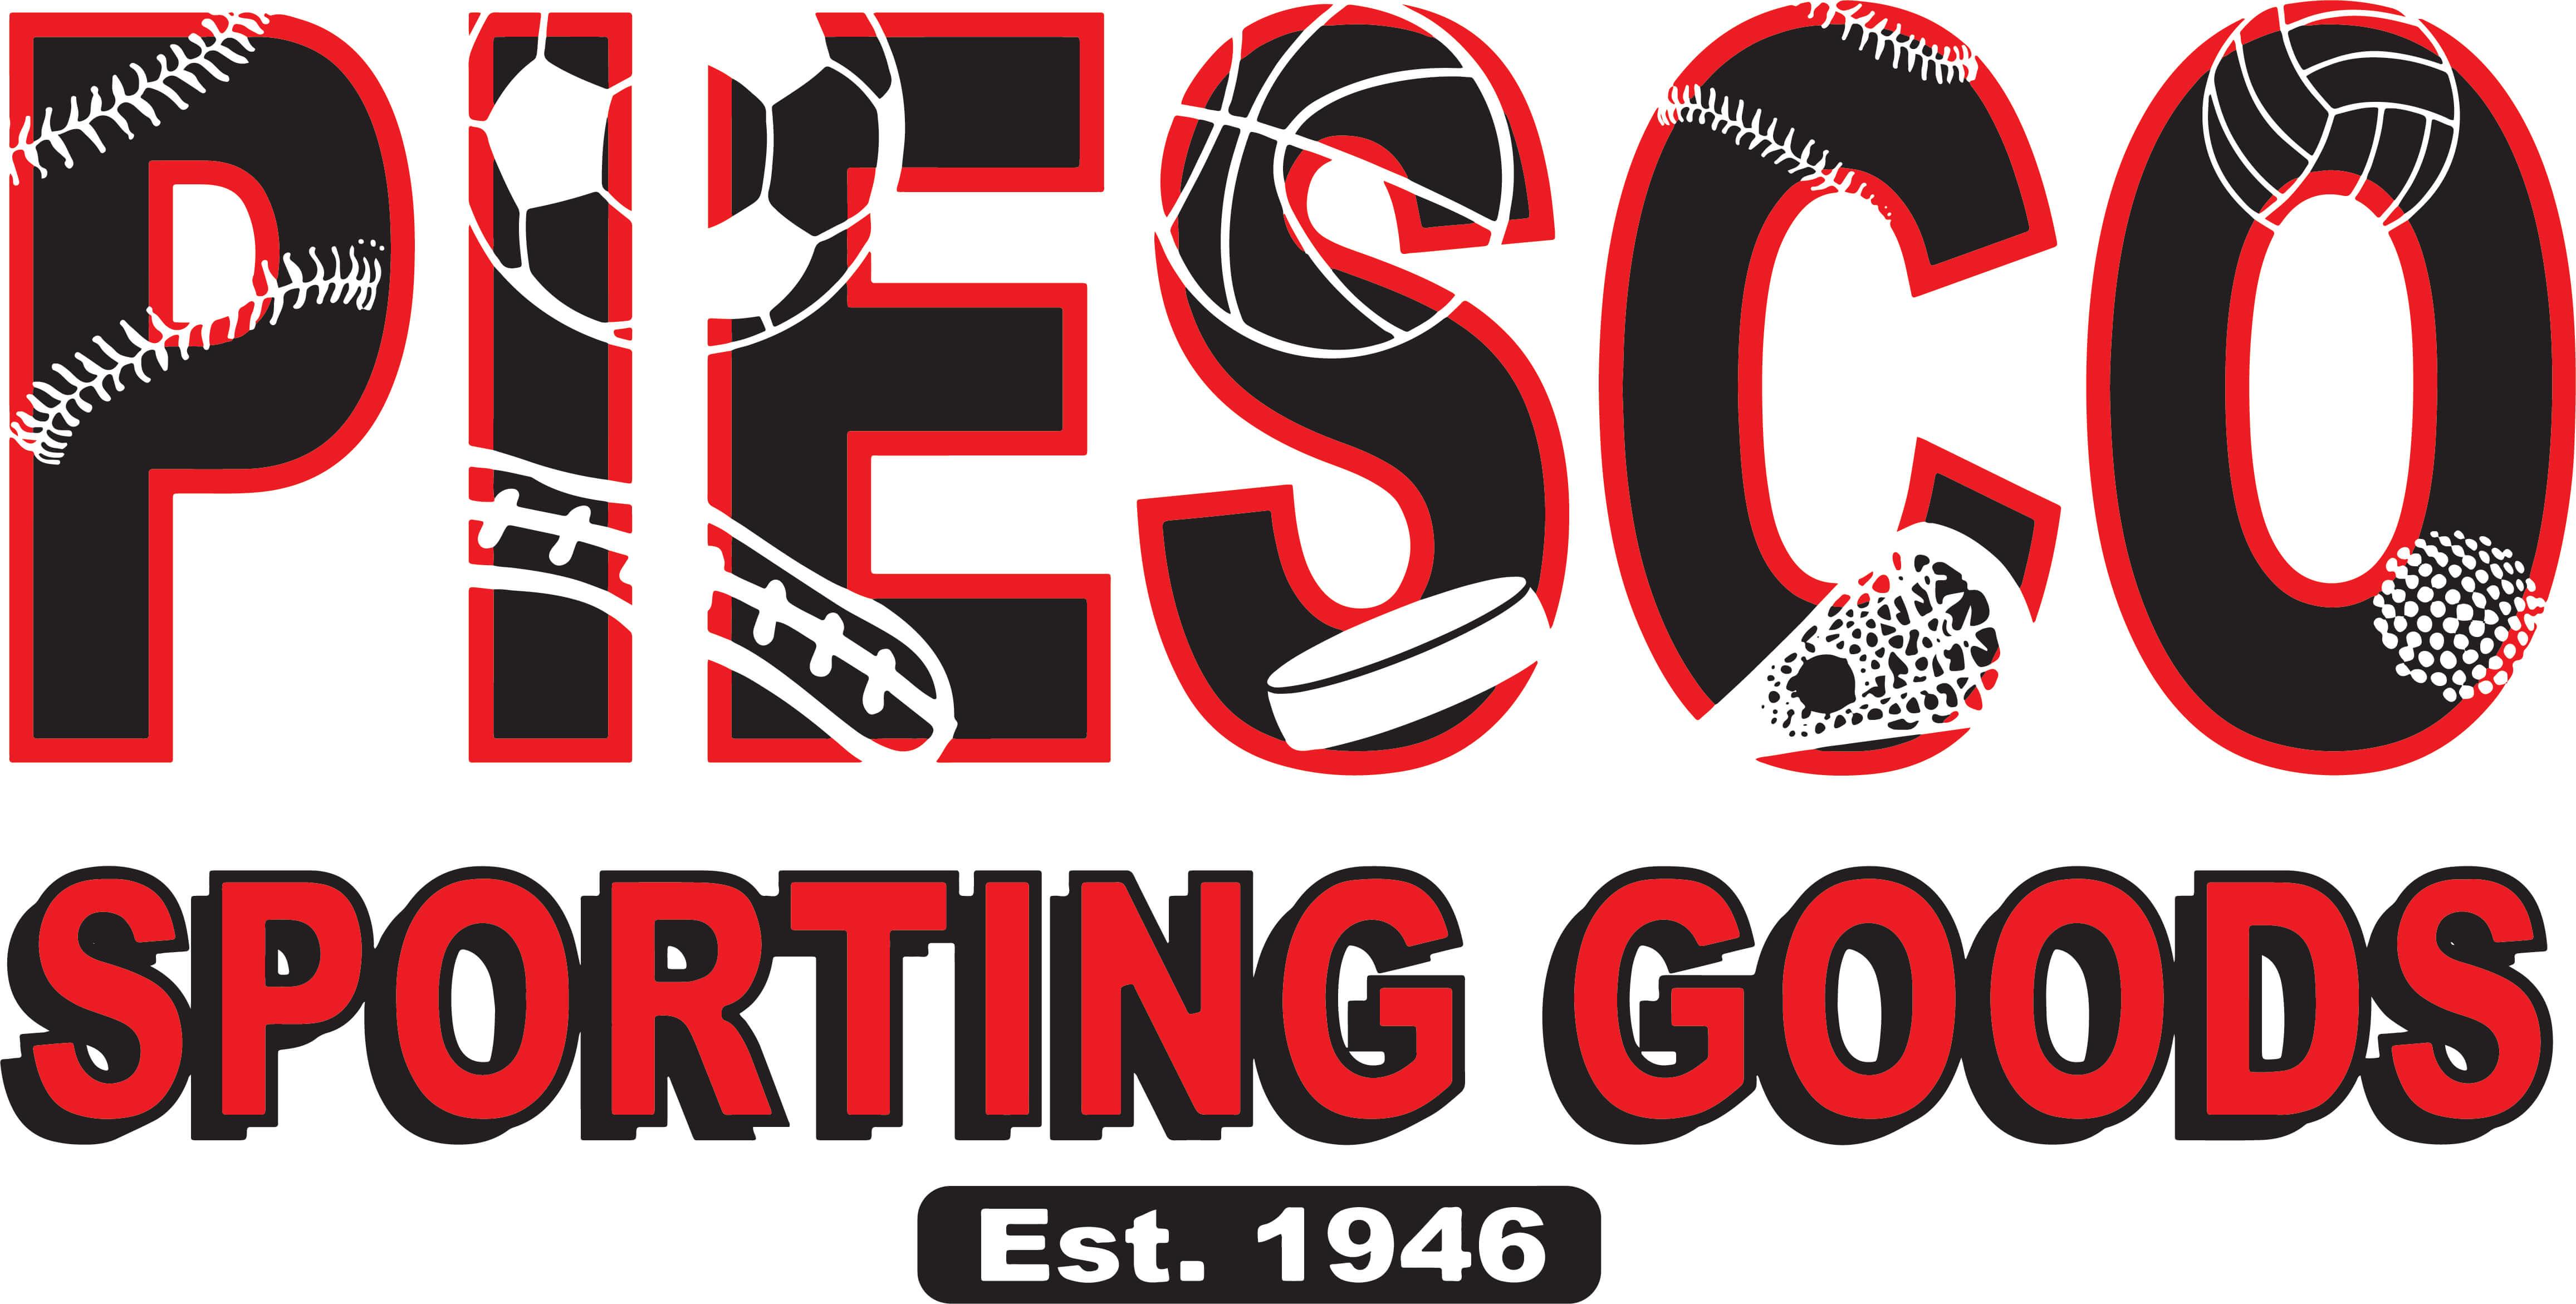 Piesco Sporting Goods